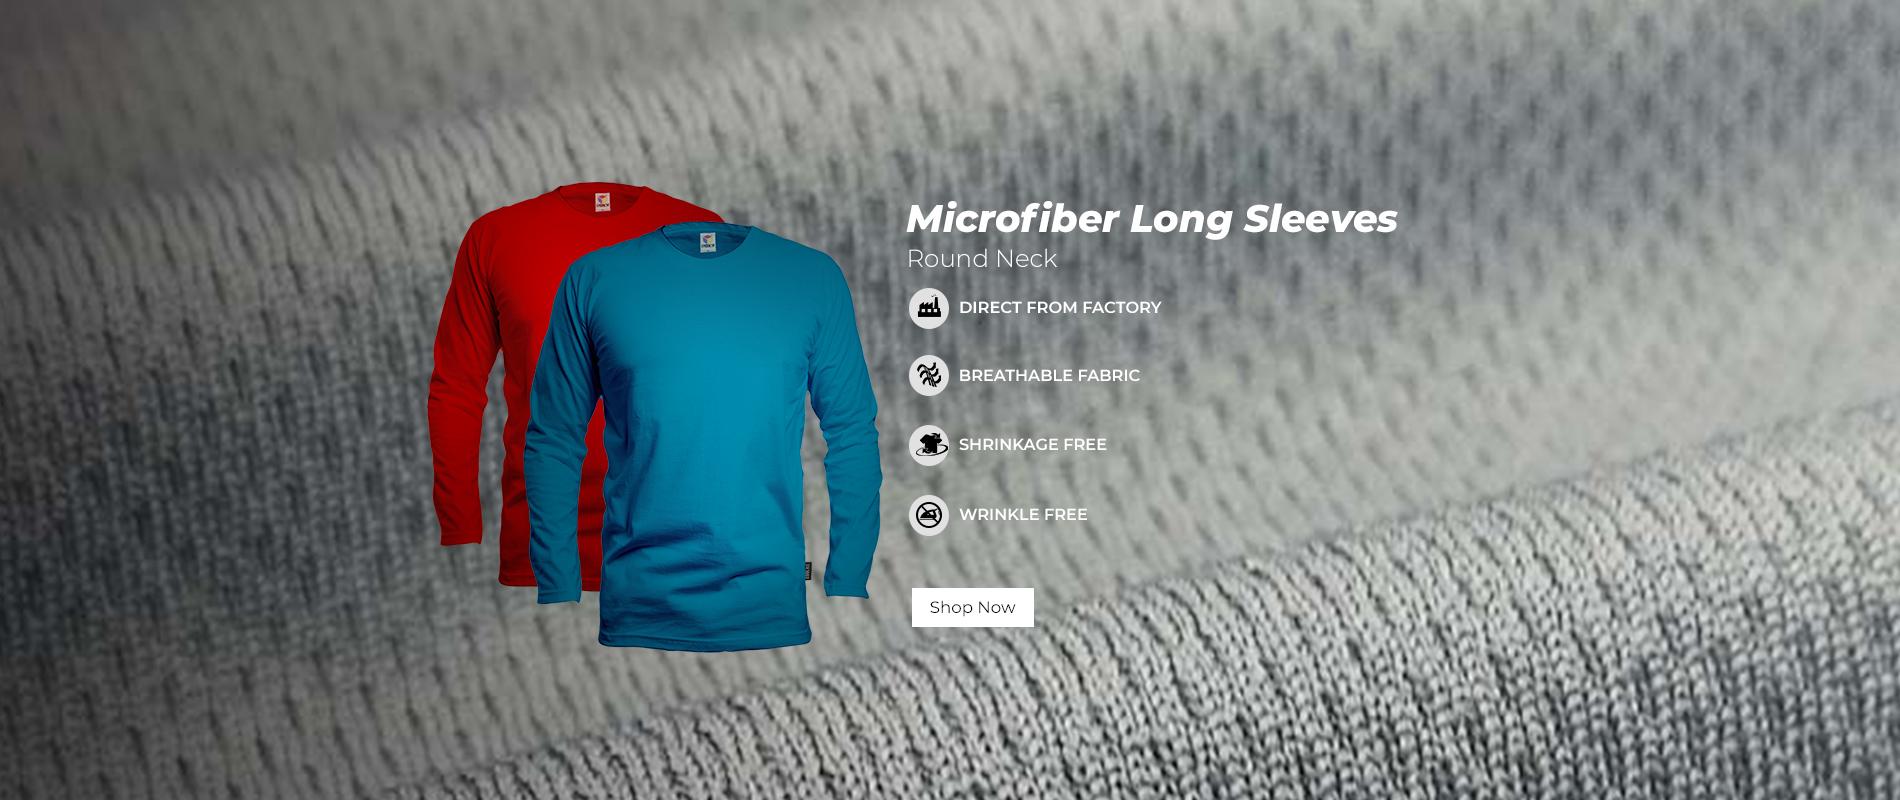 https://www.boxy.my/microfiber-long-sleeves